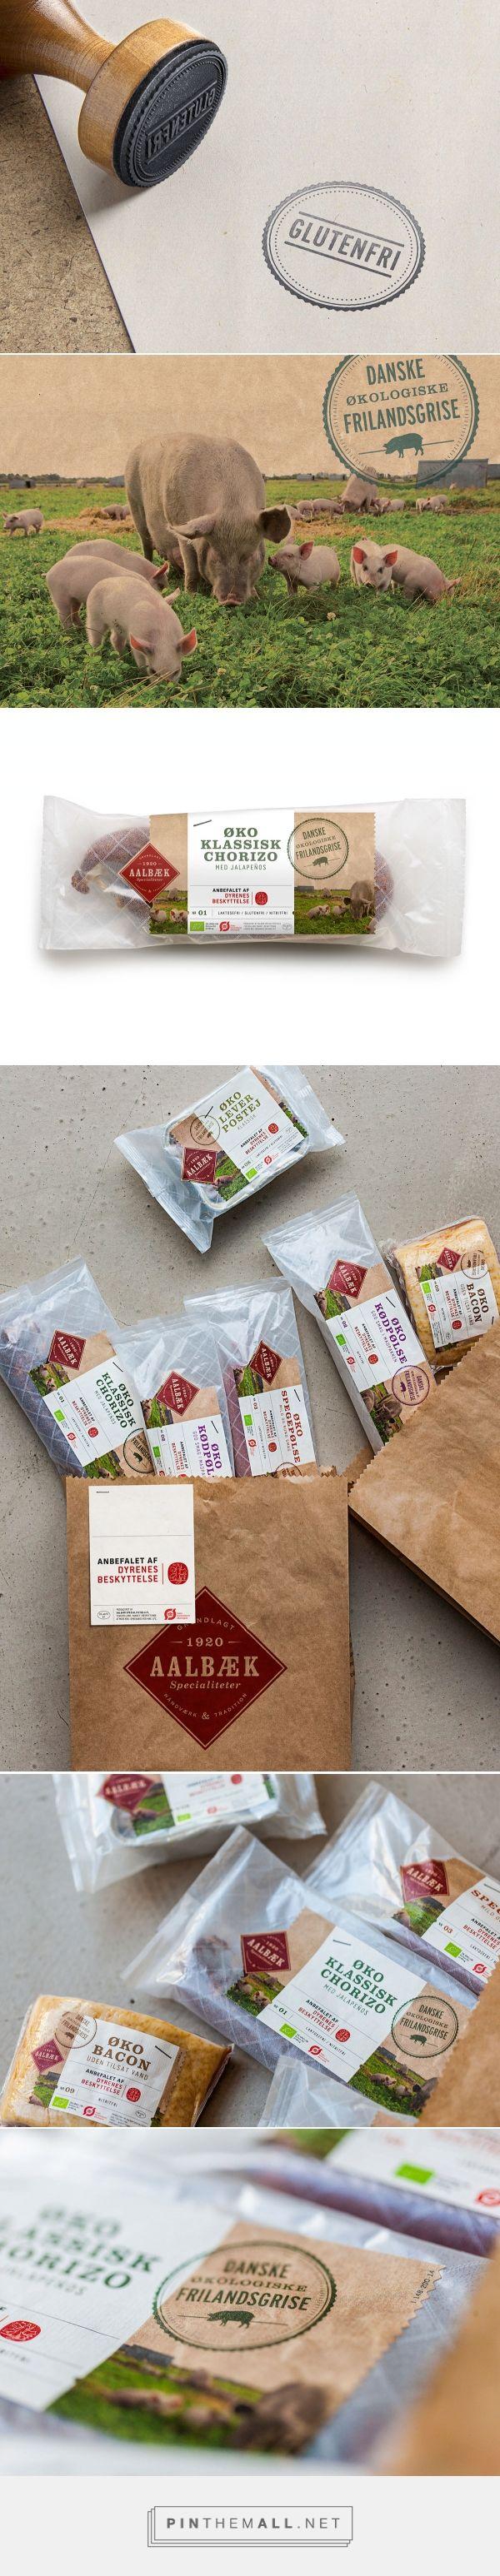 Aalbæk Welfare on Behance by Bessermachen DesignStudio curated by Packaging Diva PD. Tasty food packaging. Looks like it's gluten free too.